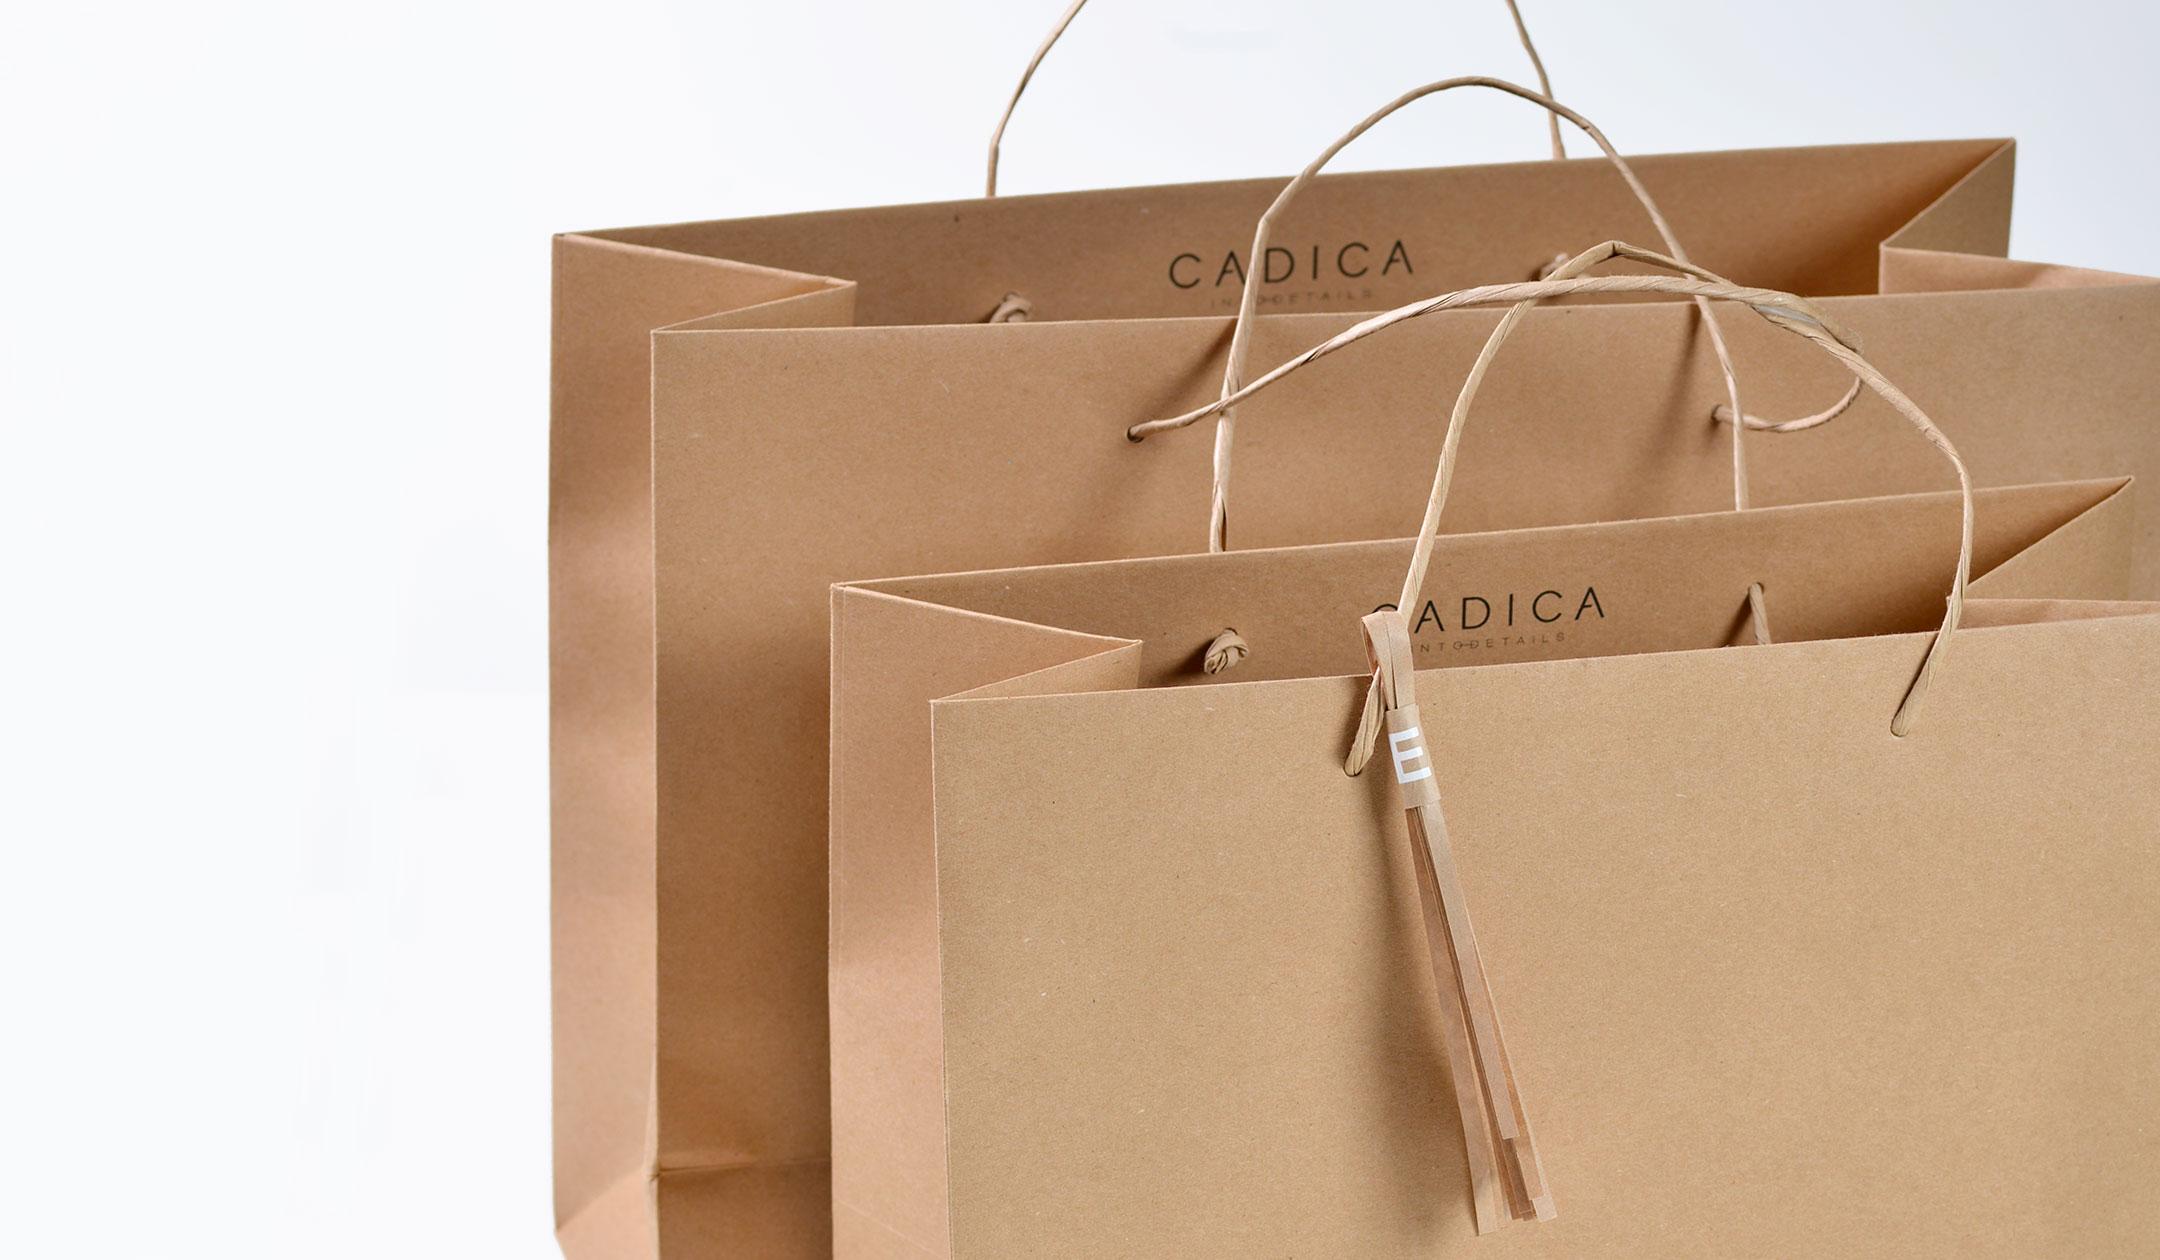 Cadica_packaging_shopper-havana